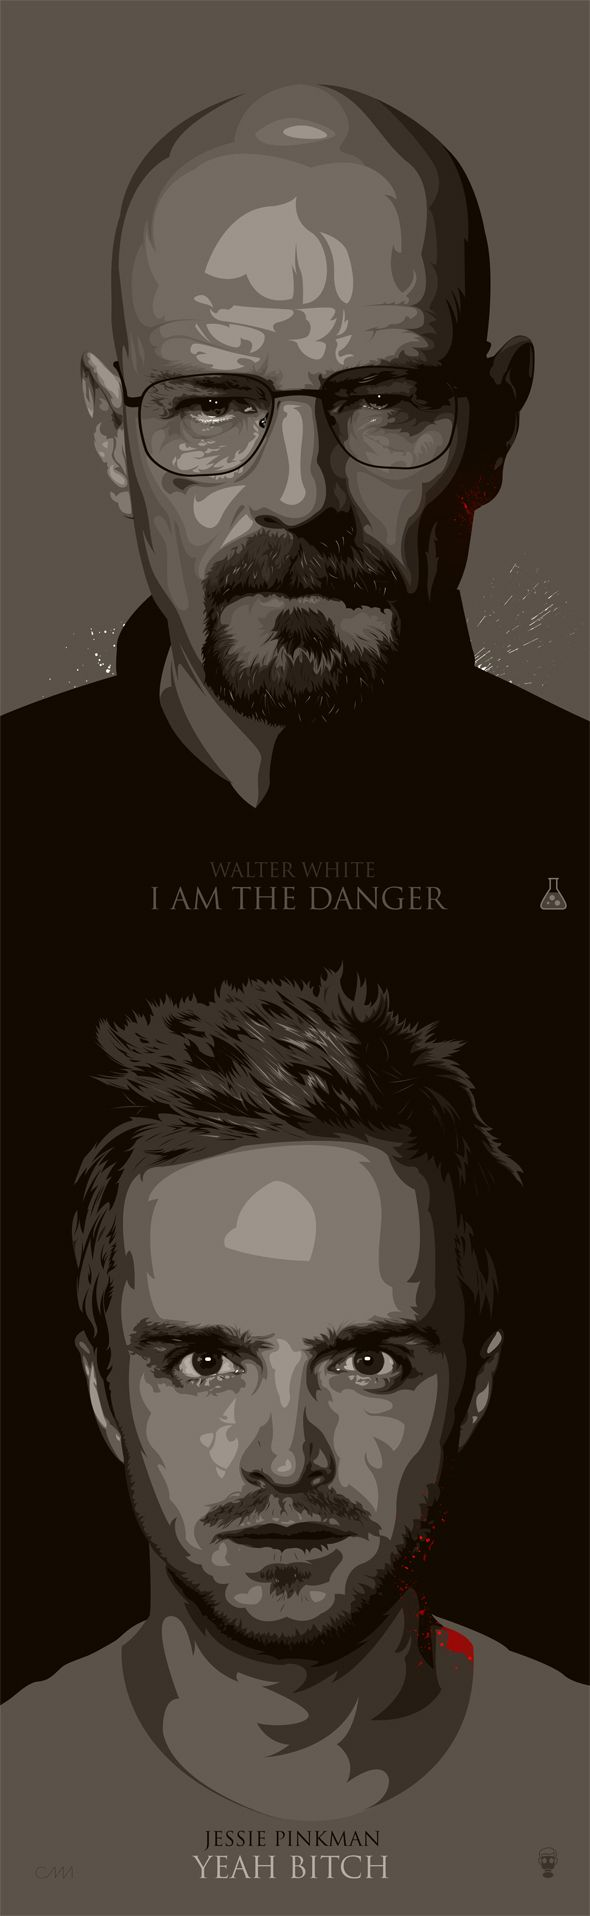 Breaking Bad Fan Art / Walter White / Jessie Pinkman by Ciaran Monaghan, via Behance